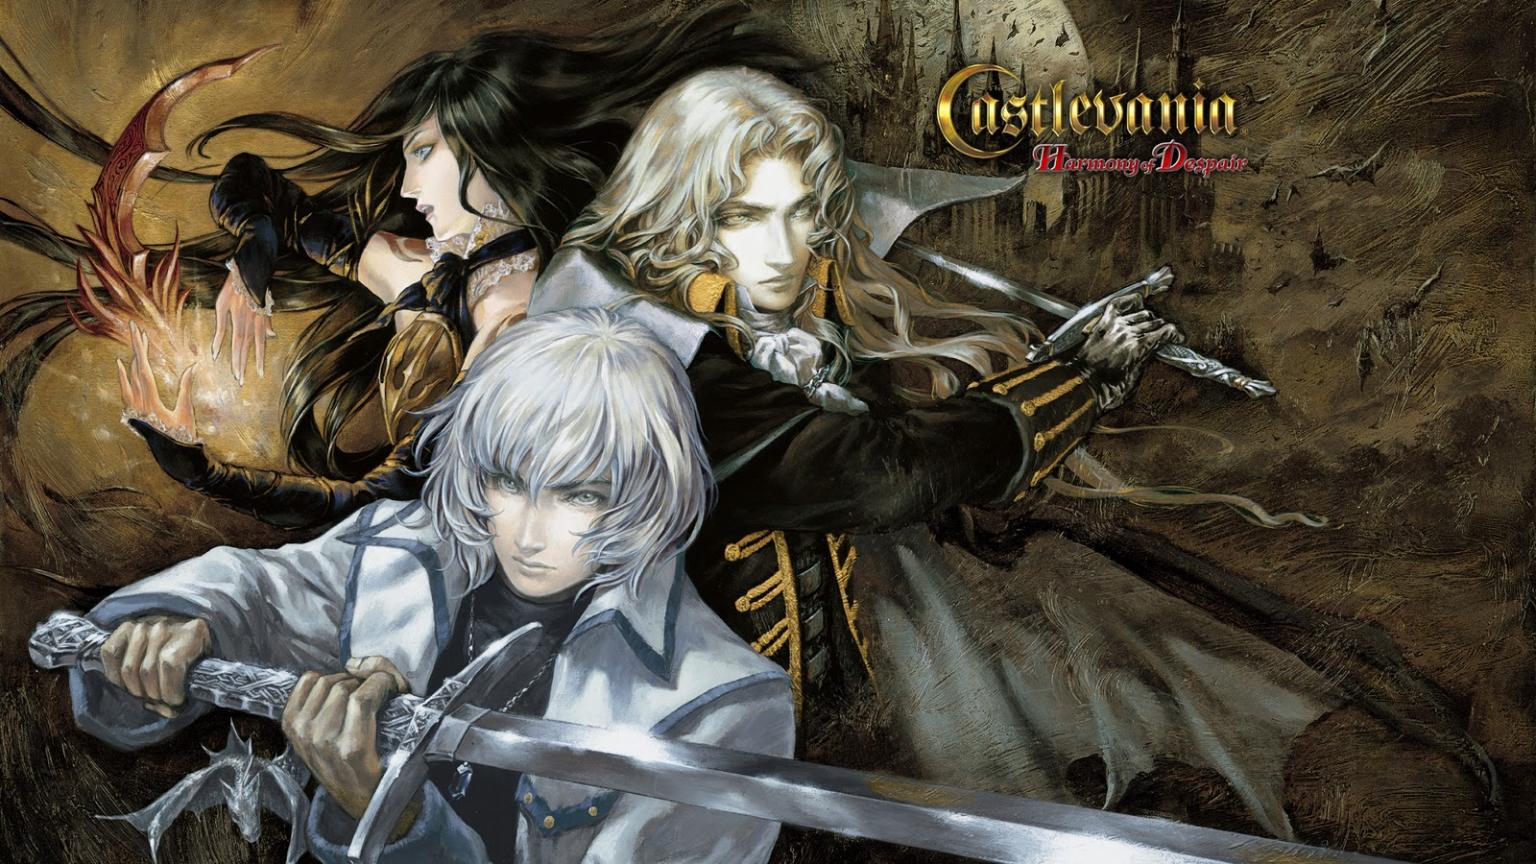 Free Download Castlevania Dawn Of Sorrow Hd Wallpaper 8 1600 X 900